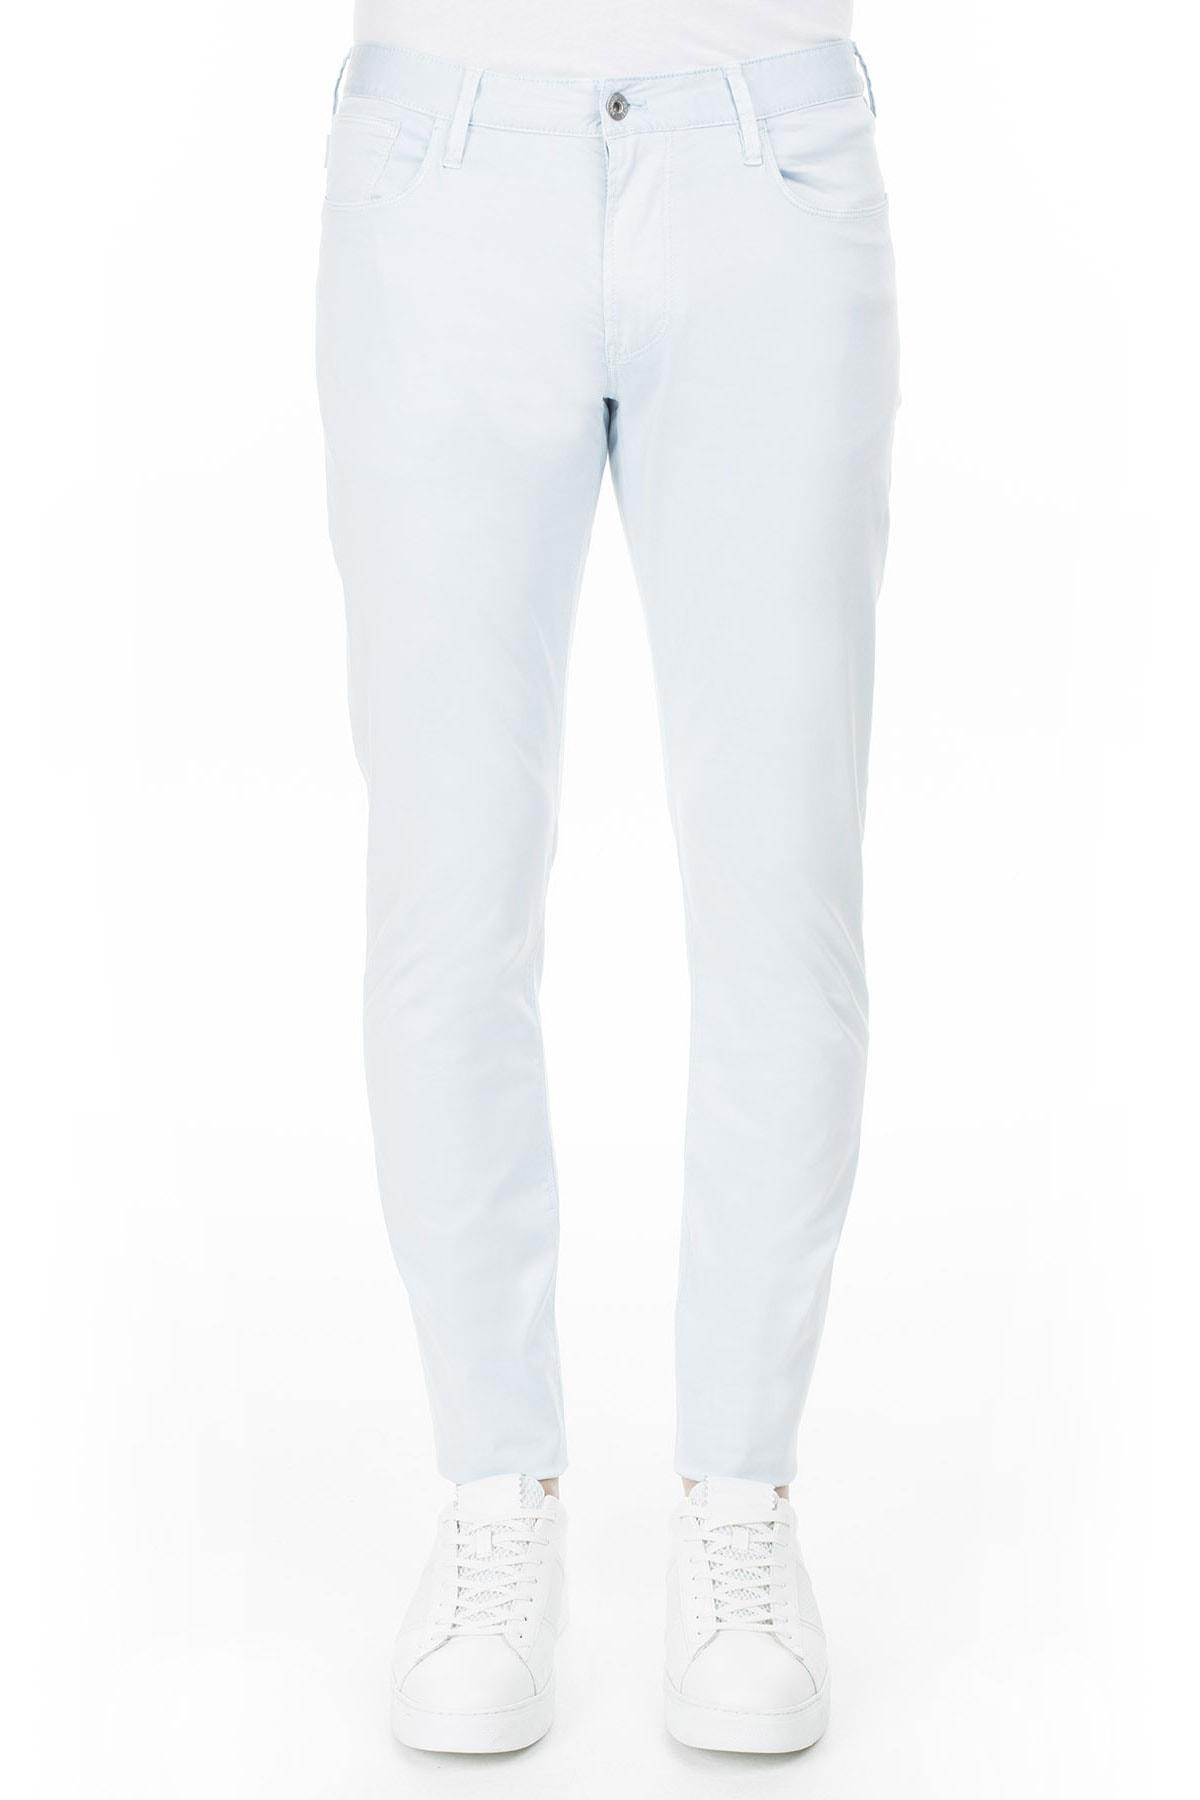 Armani Jeans Armani J06 Jeans Erkek Pamuklu Pantolon 3Y6J06 6Nedz 0504 2